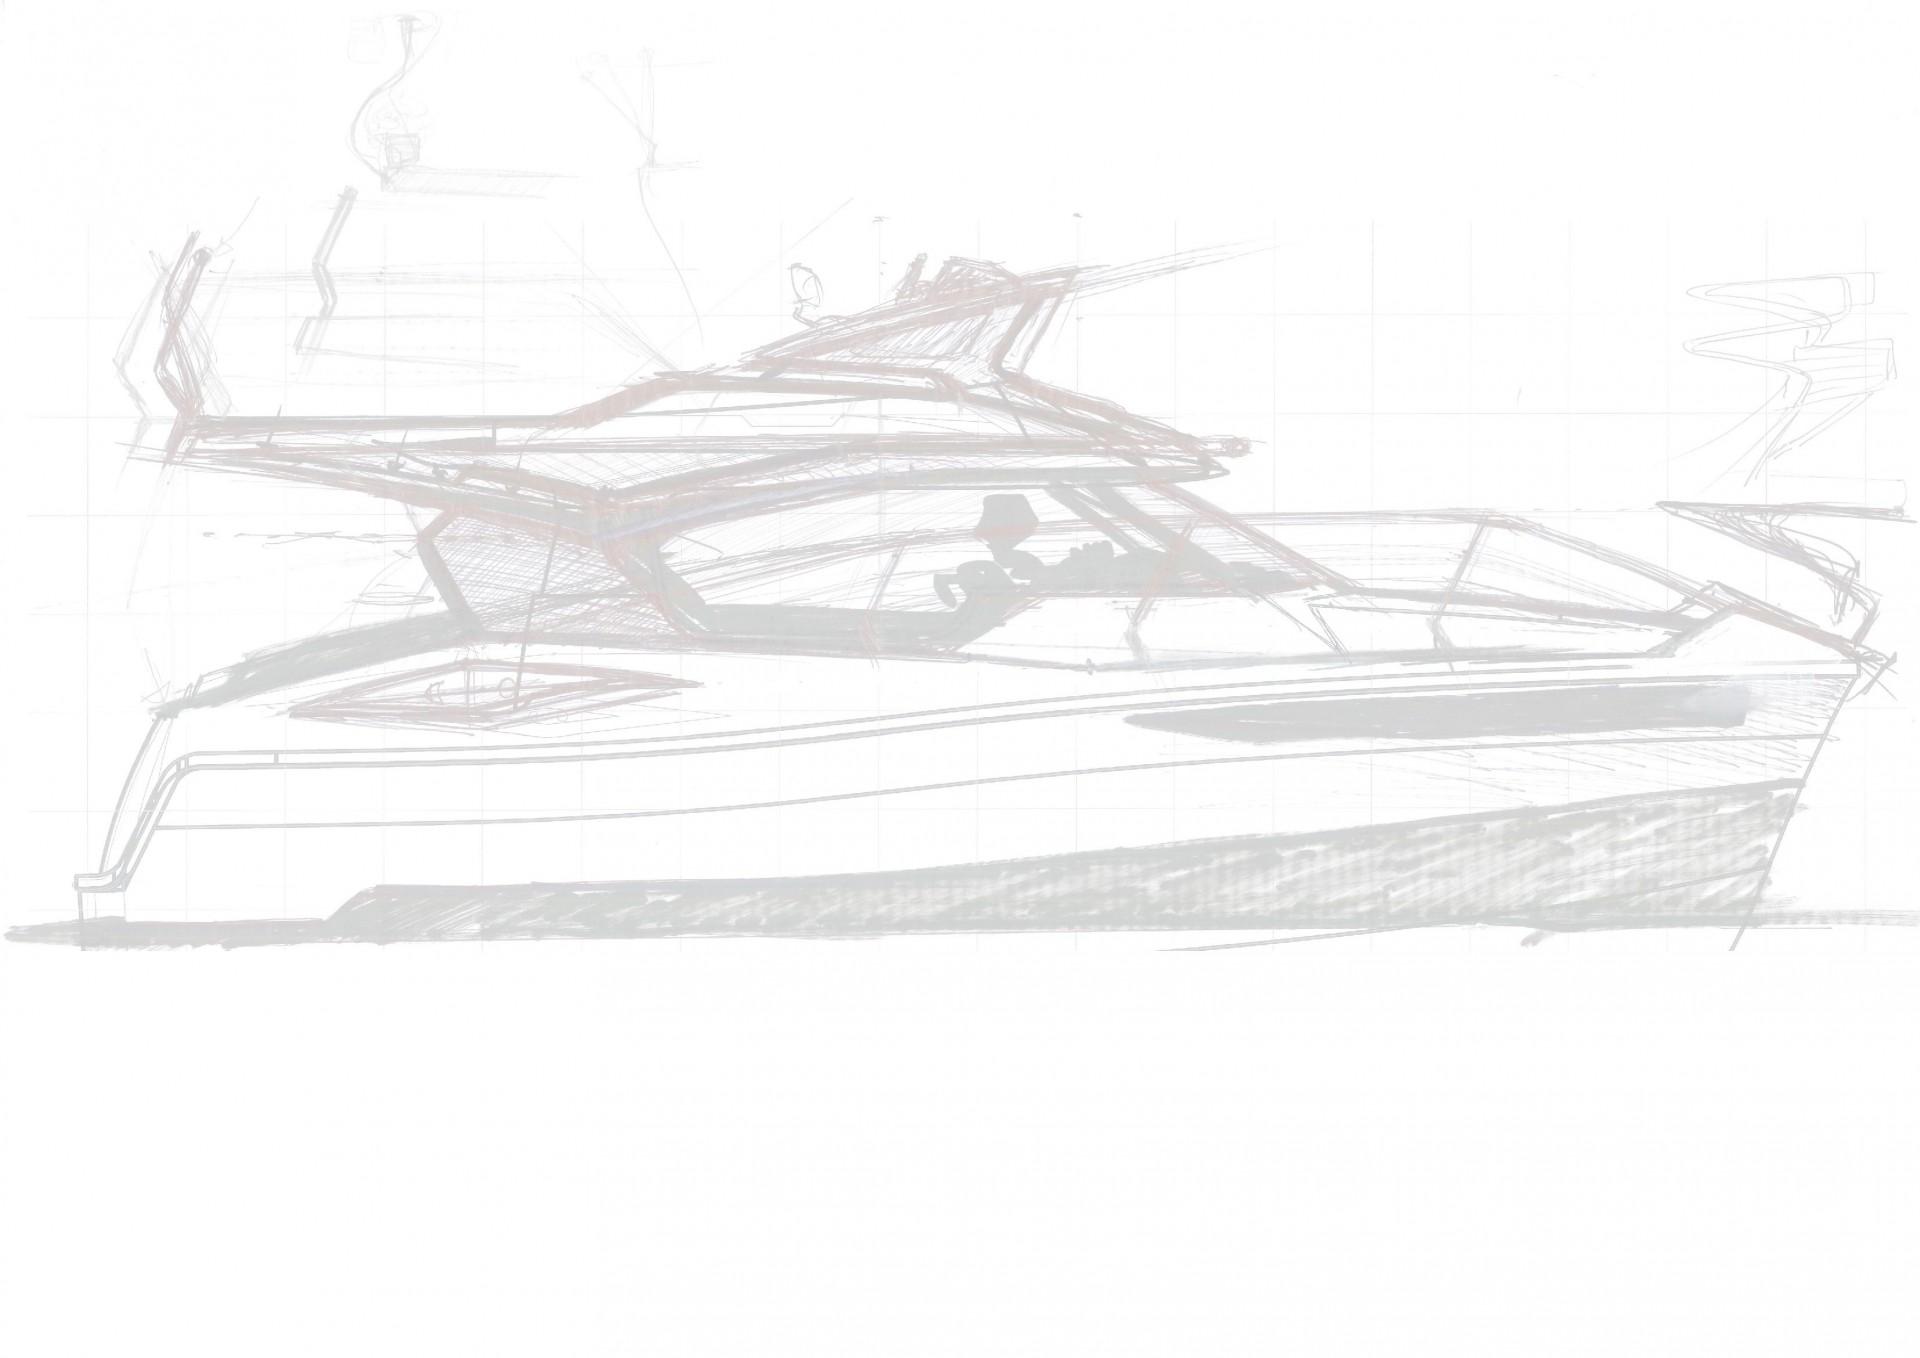 bateau  u00e0 moteur ocqueteau range cruiser 975 fly inboard - notre gamme